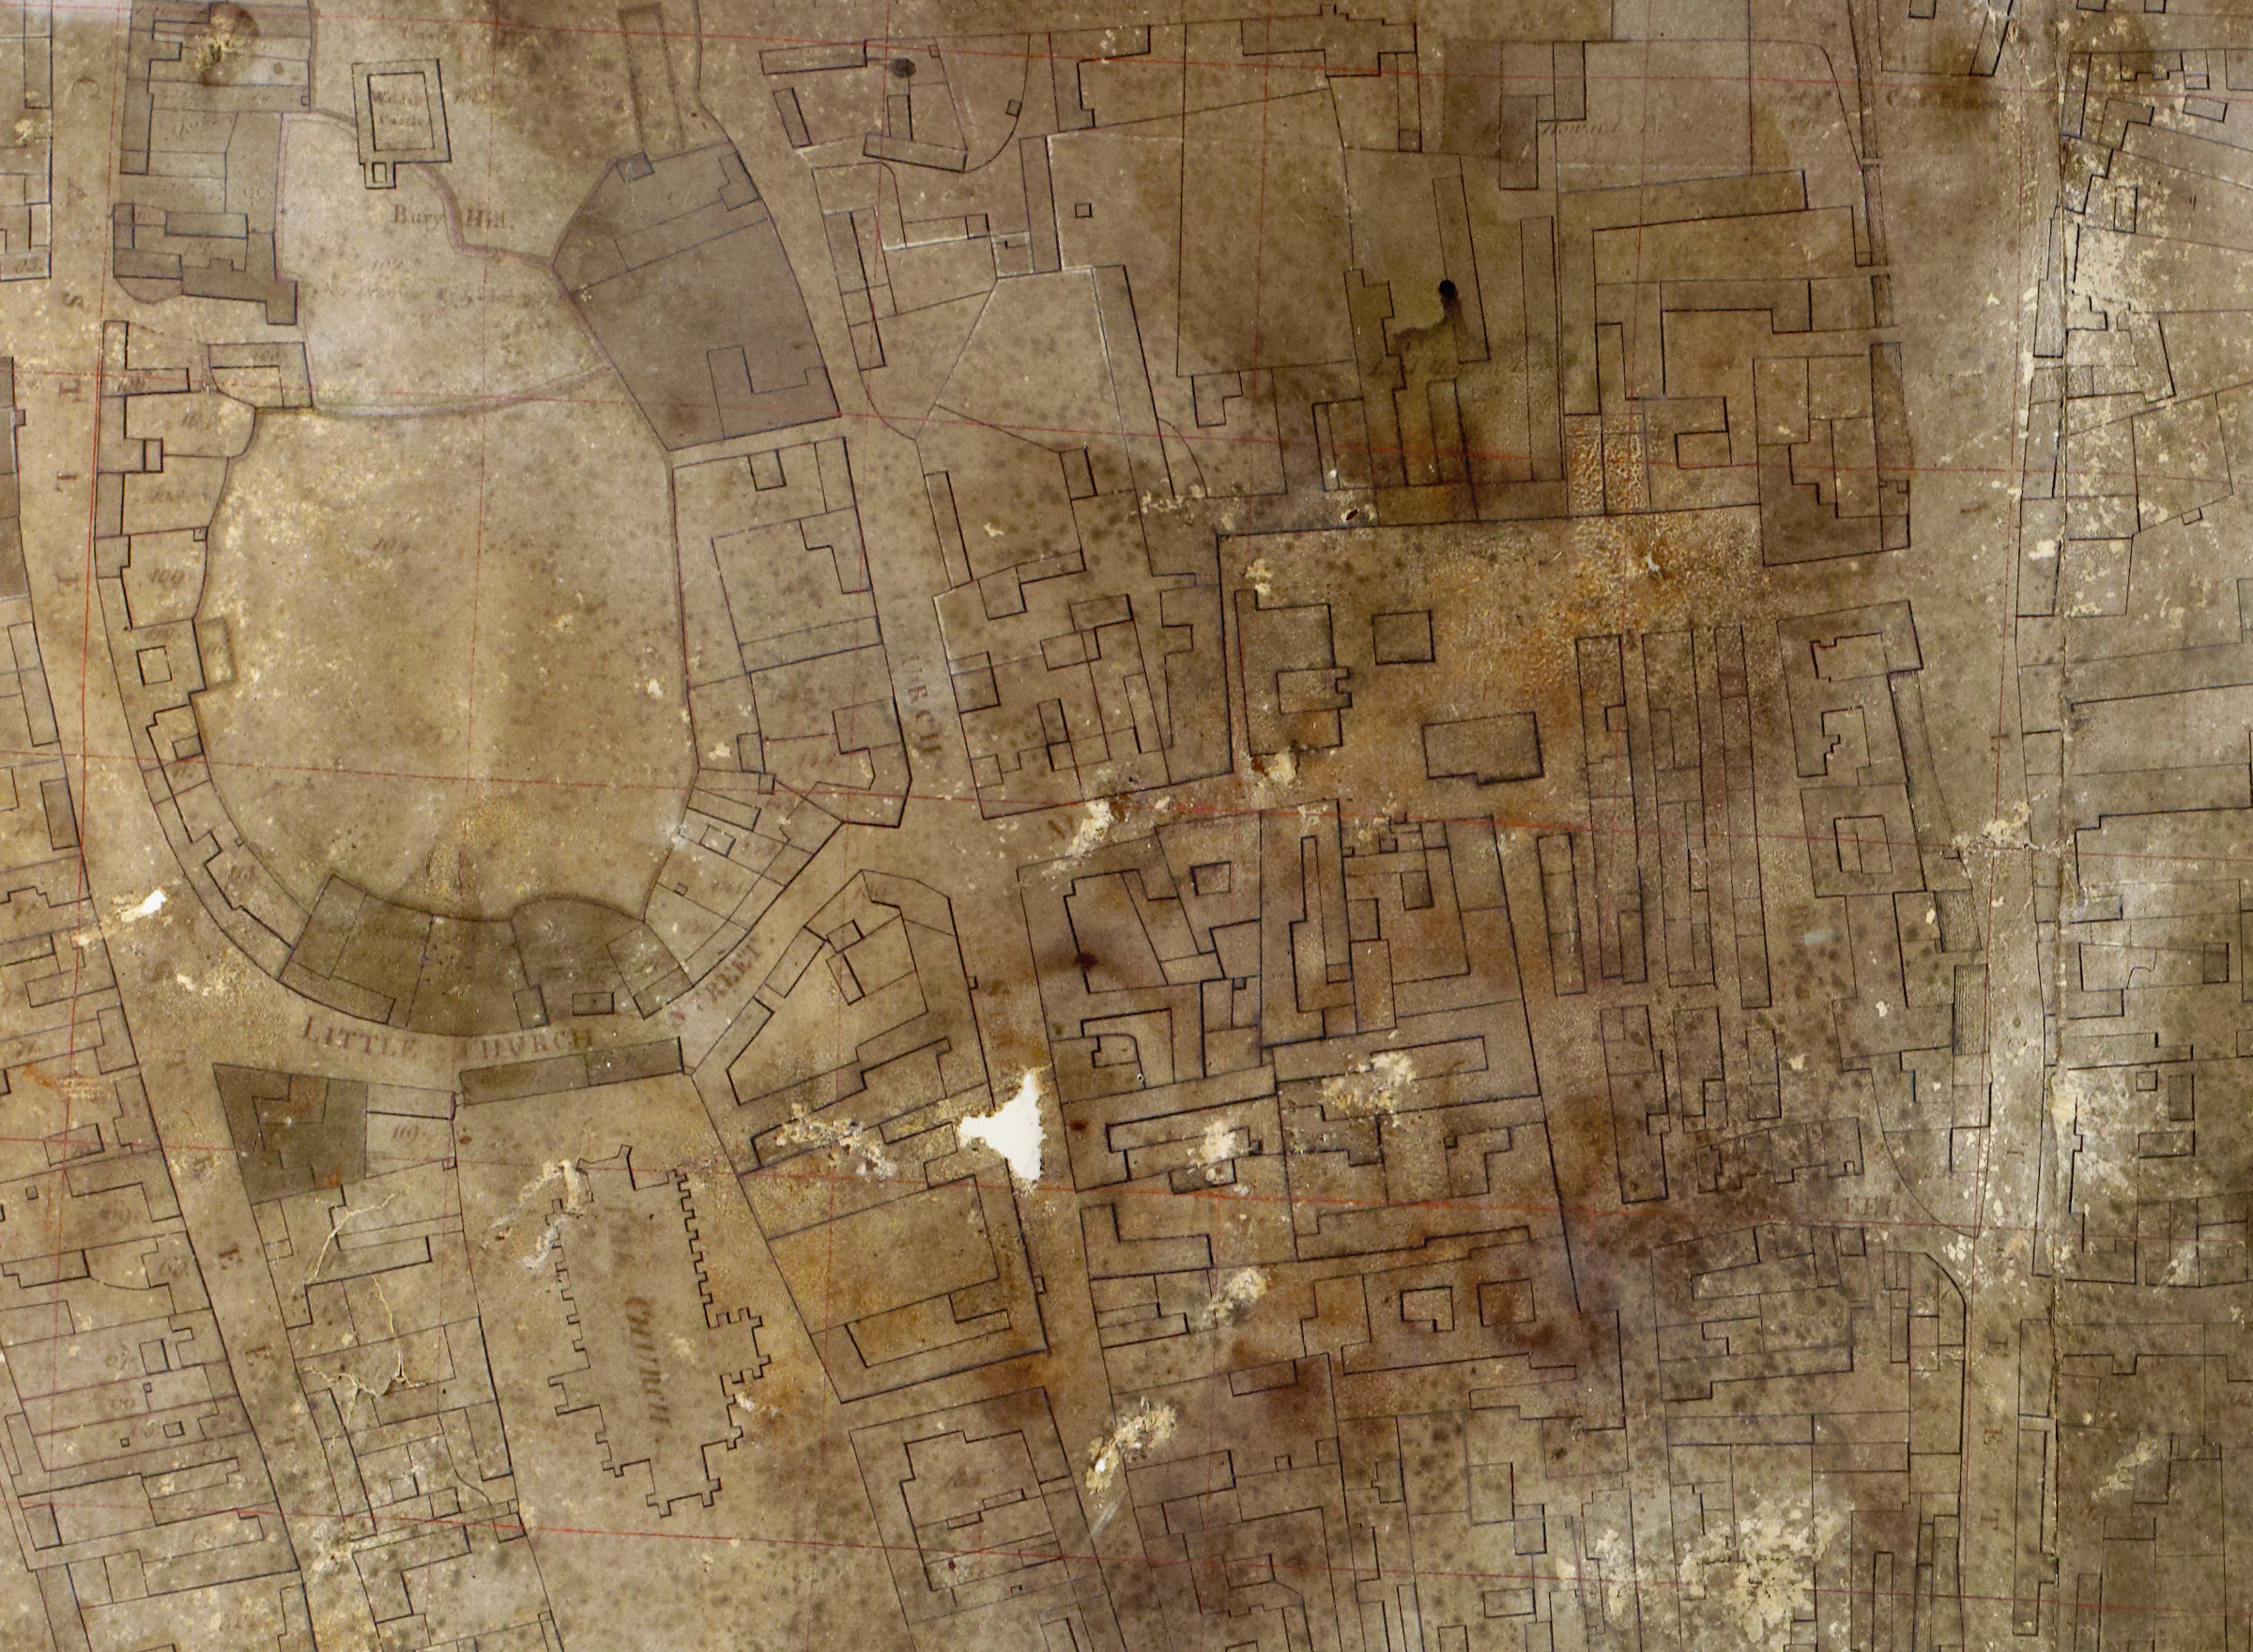 Edward John Eyre's 1757 map of Saffron Walden